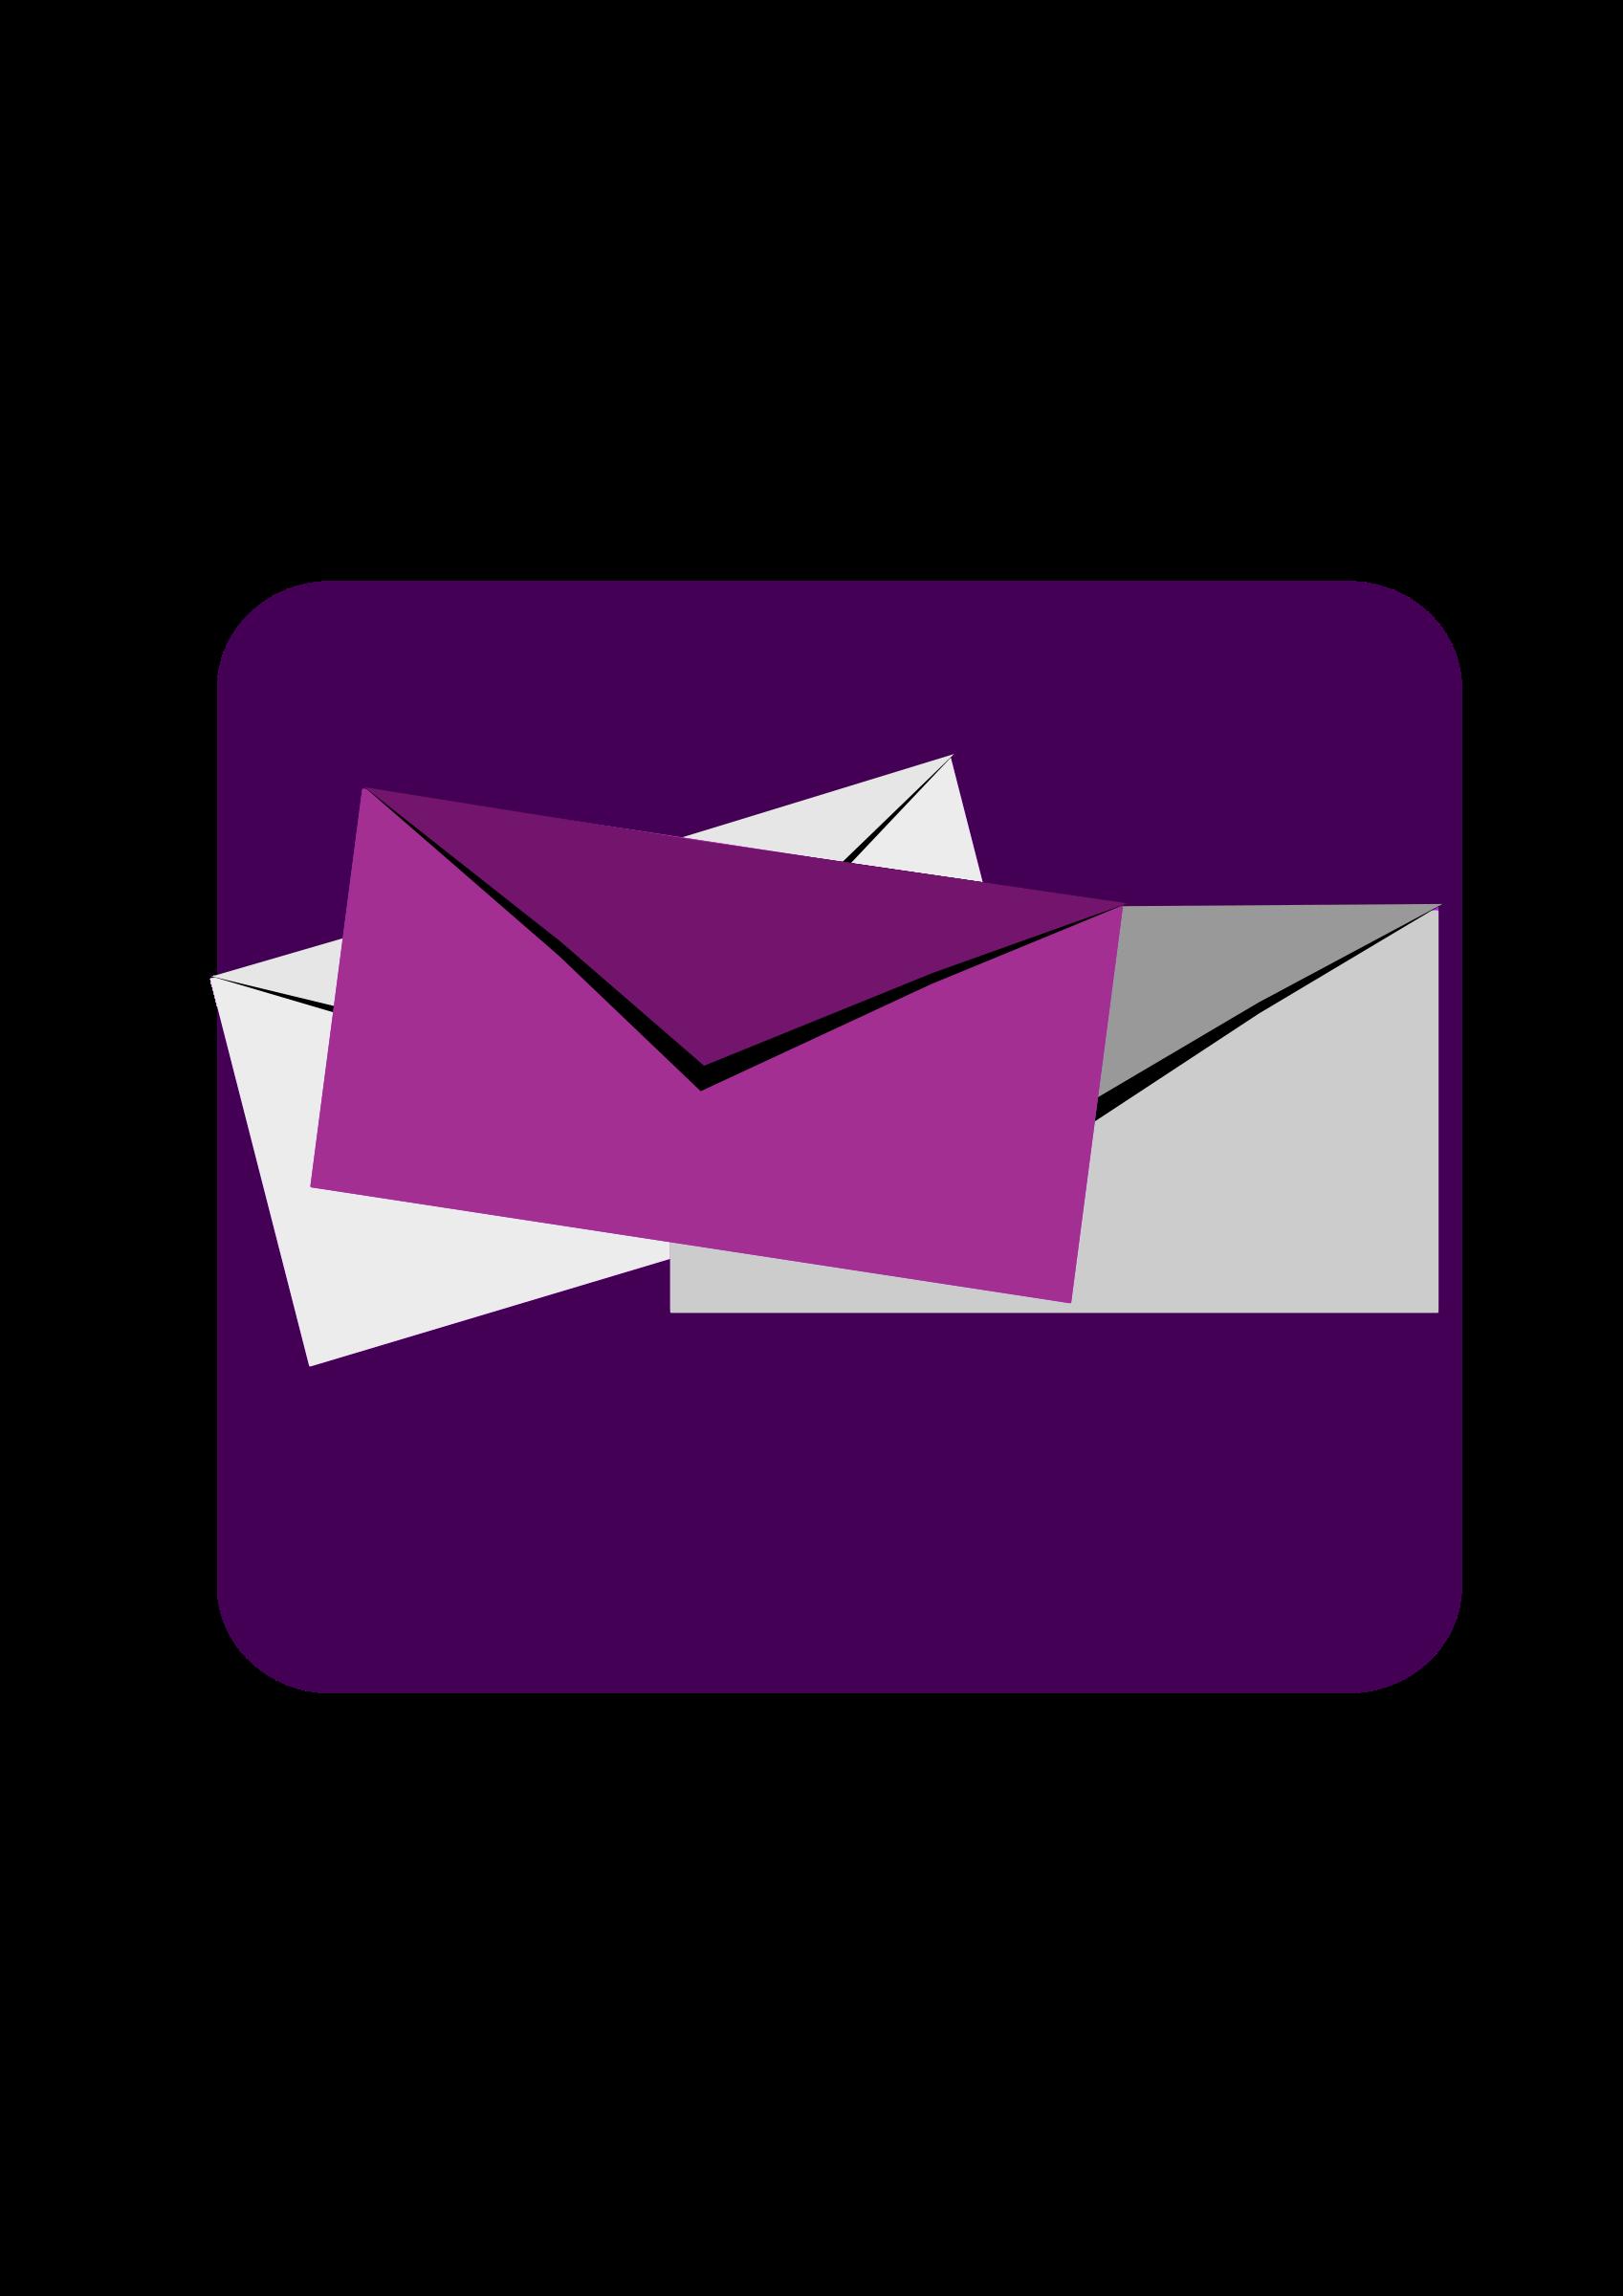 Sms big image png. E clipart purple